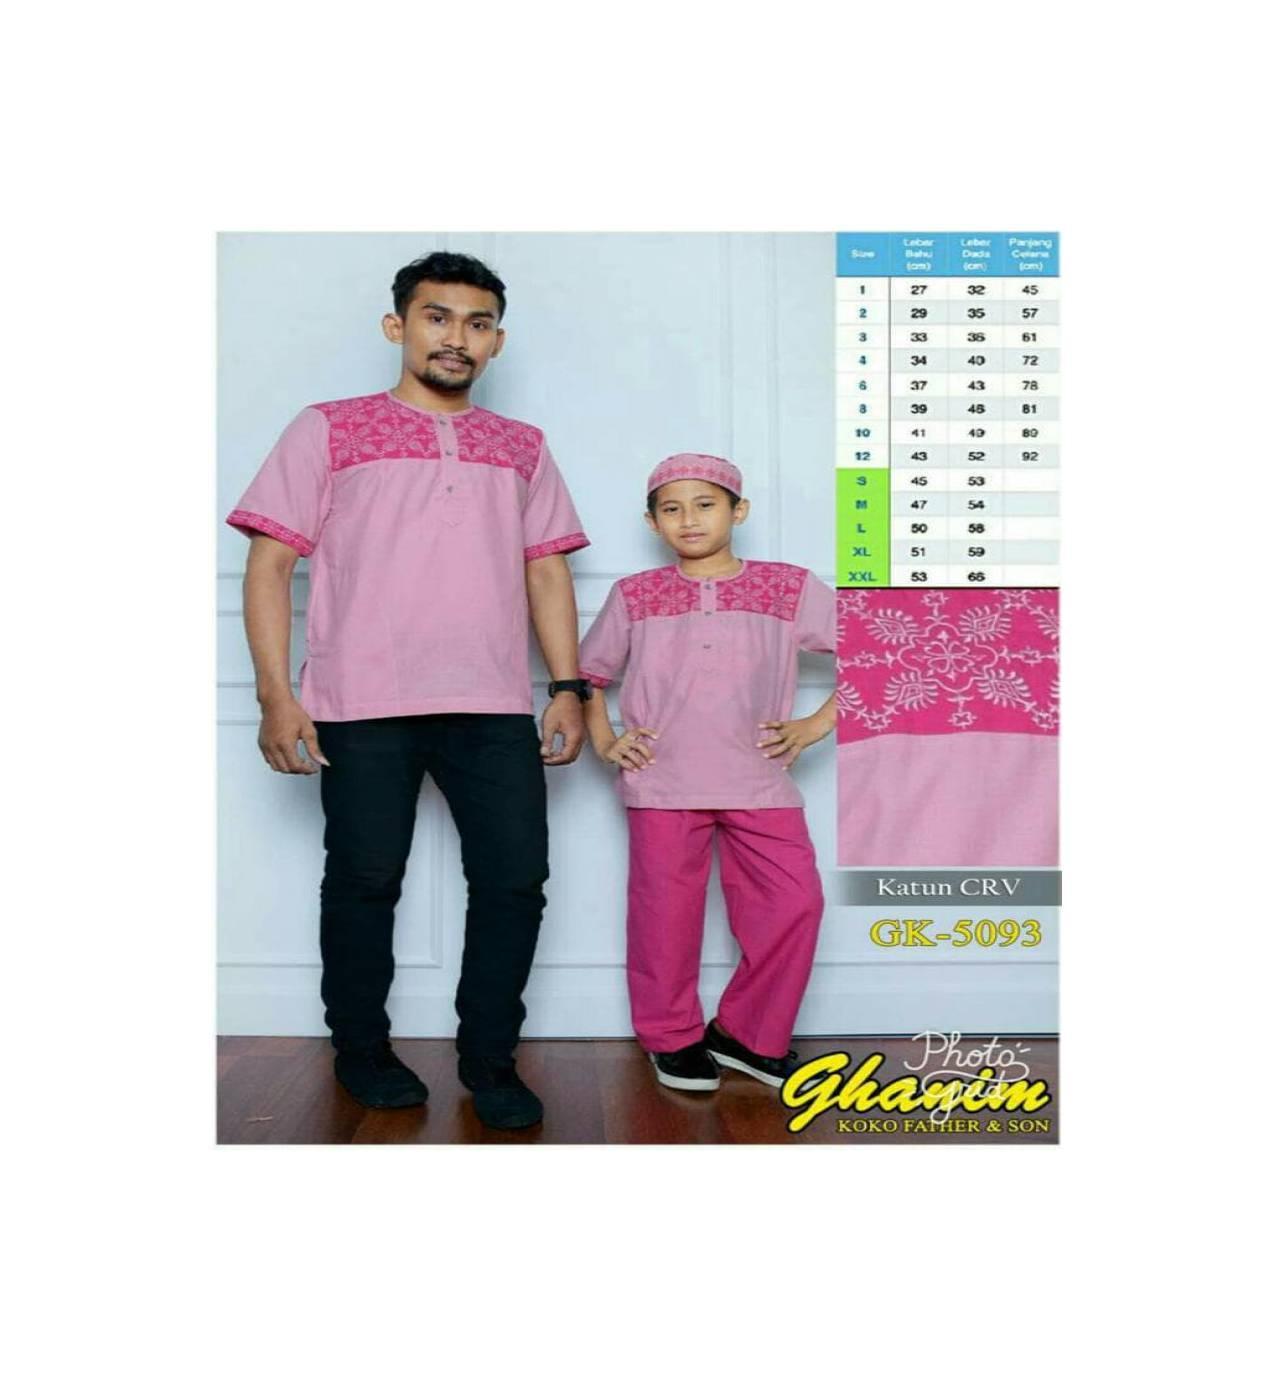 Beli Koko Anak Ayah Store Marwanto606 Baju Batik Couple Gk 5093